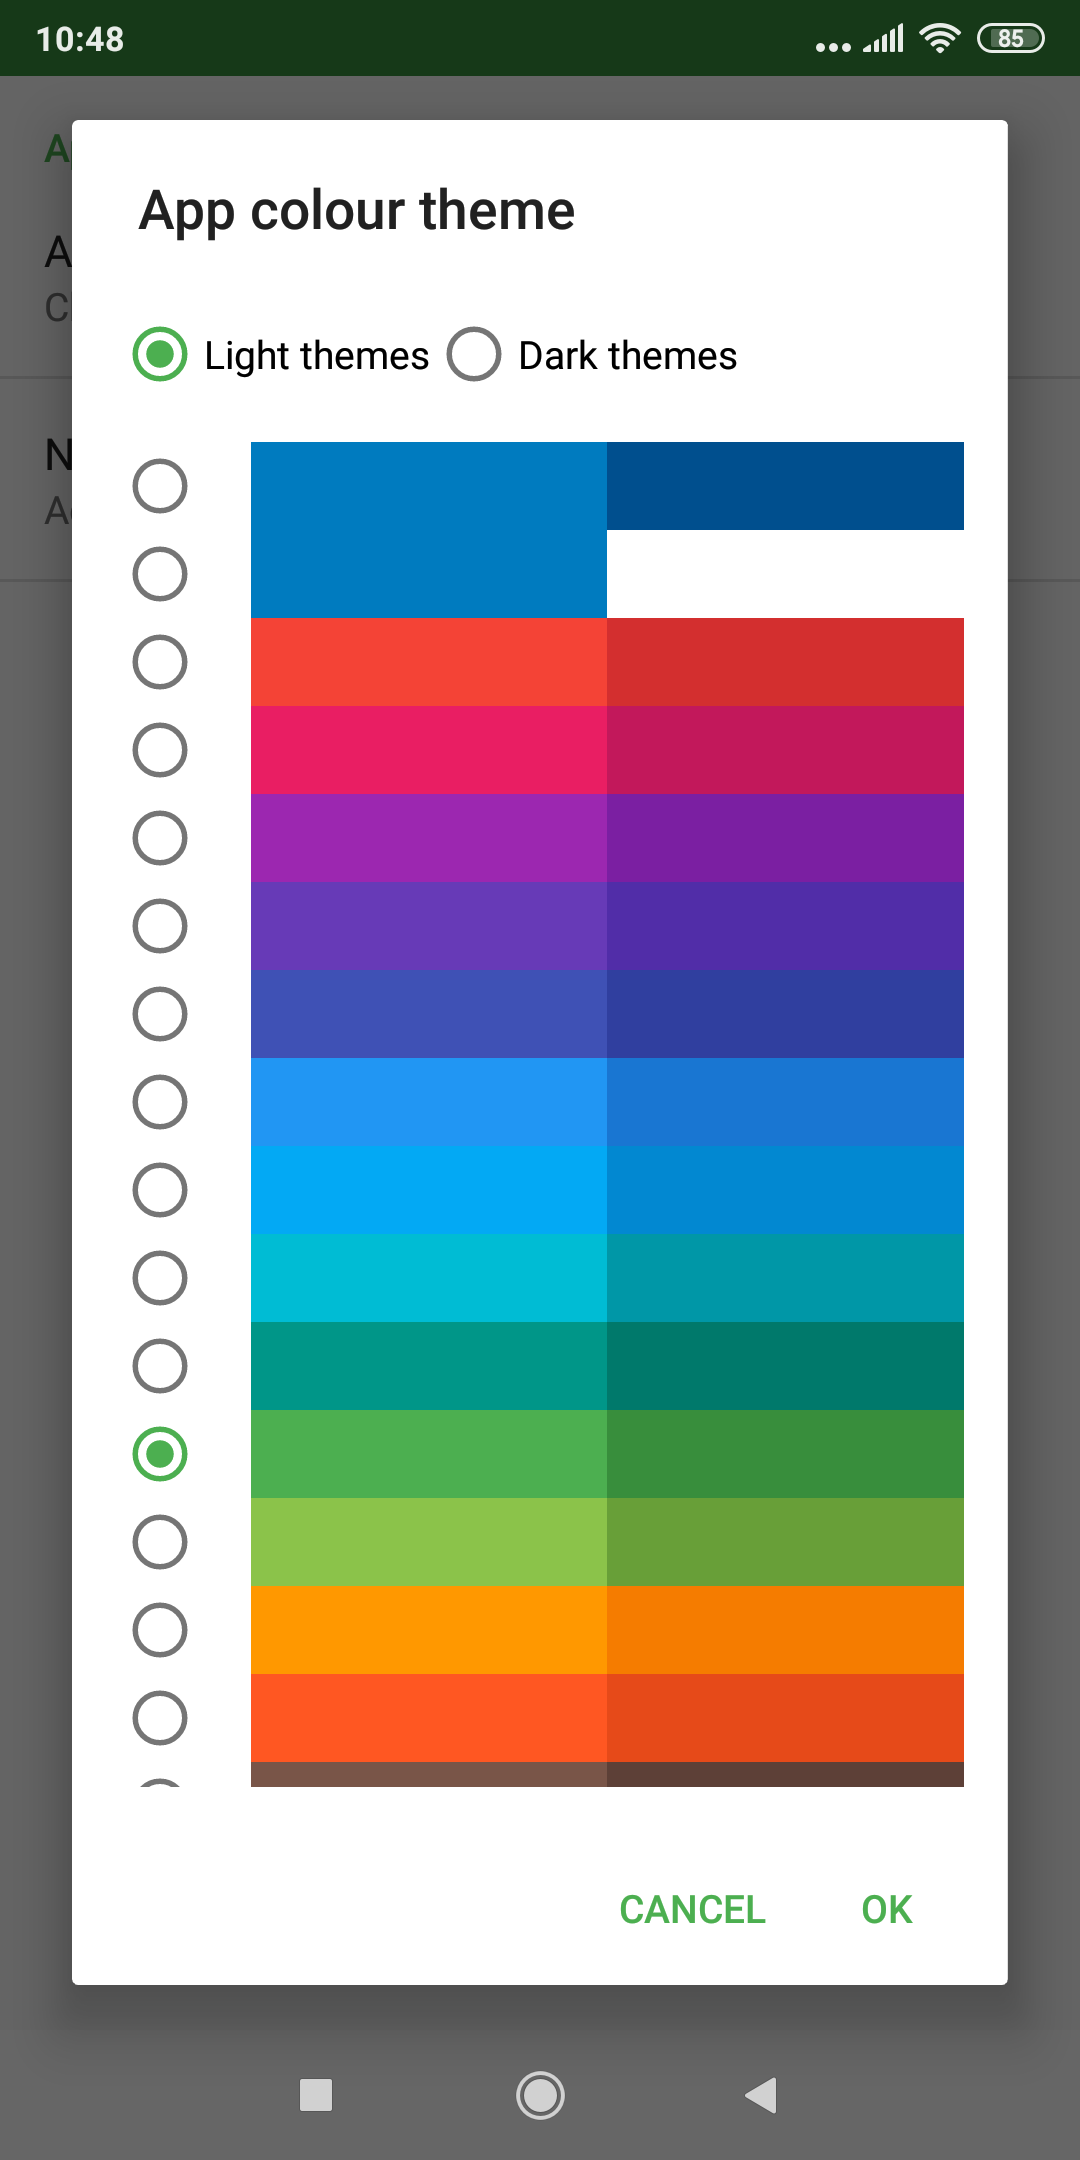 mapFactor Navigator 5.0 - App colour themes